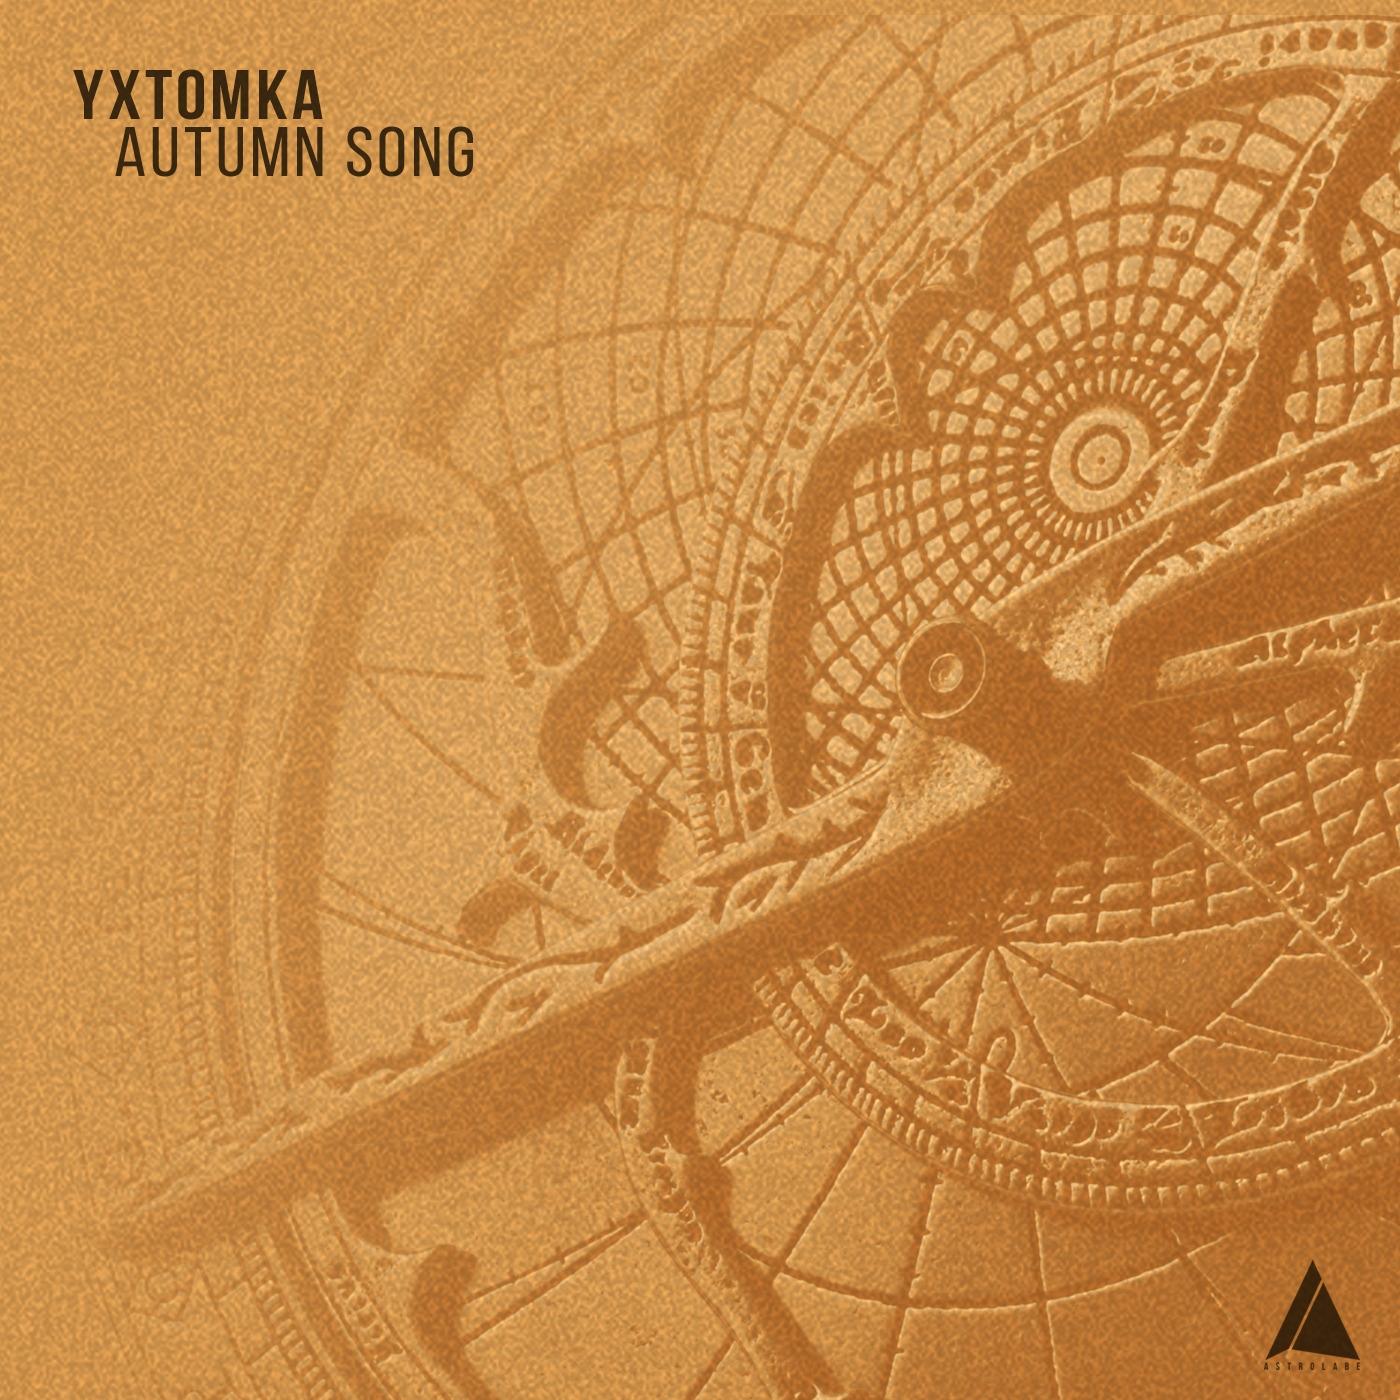 Yxtomka - Leaf in the Wind (Original Mix)